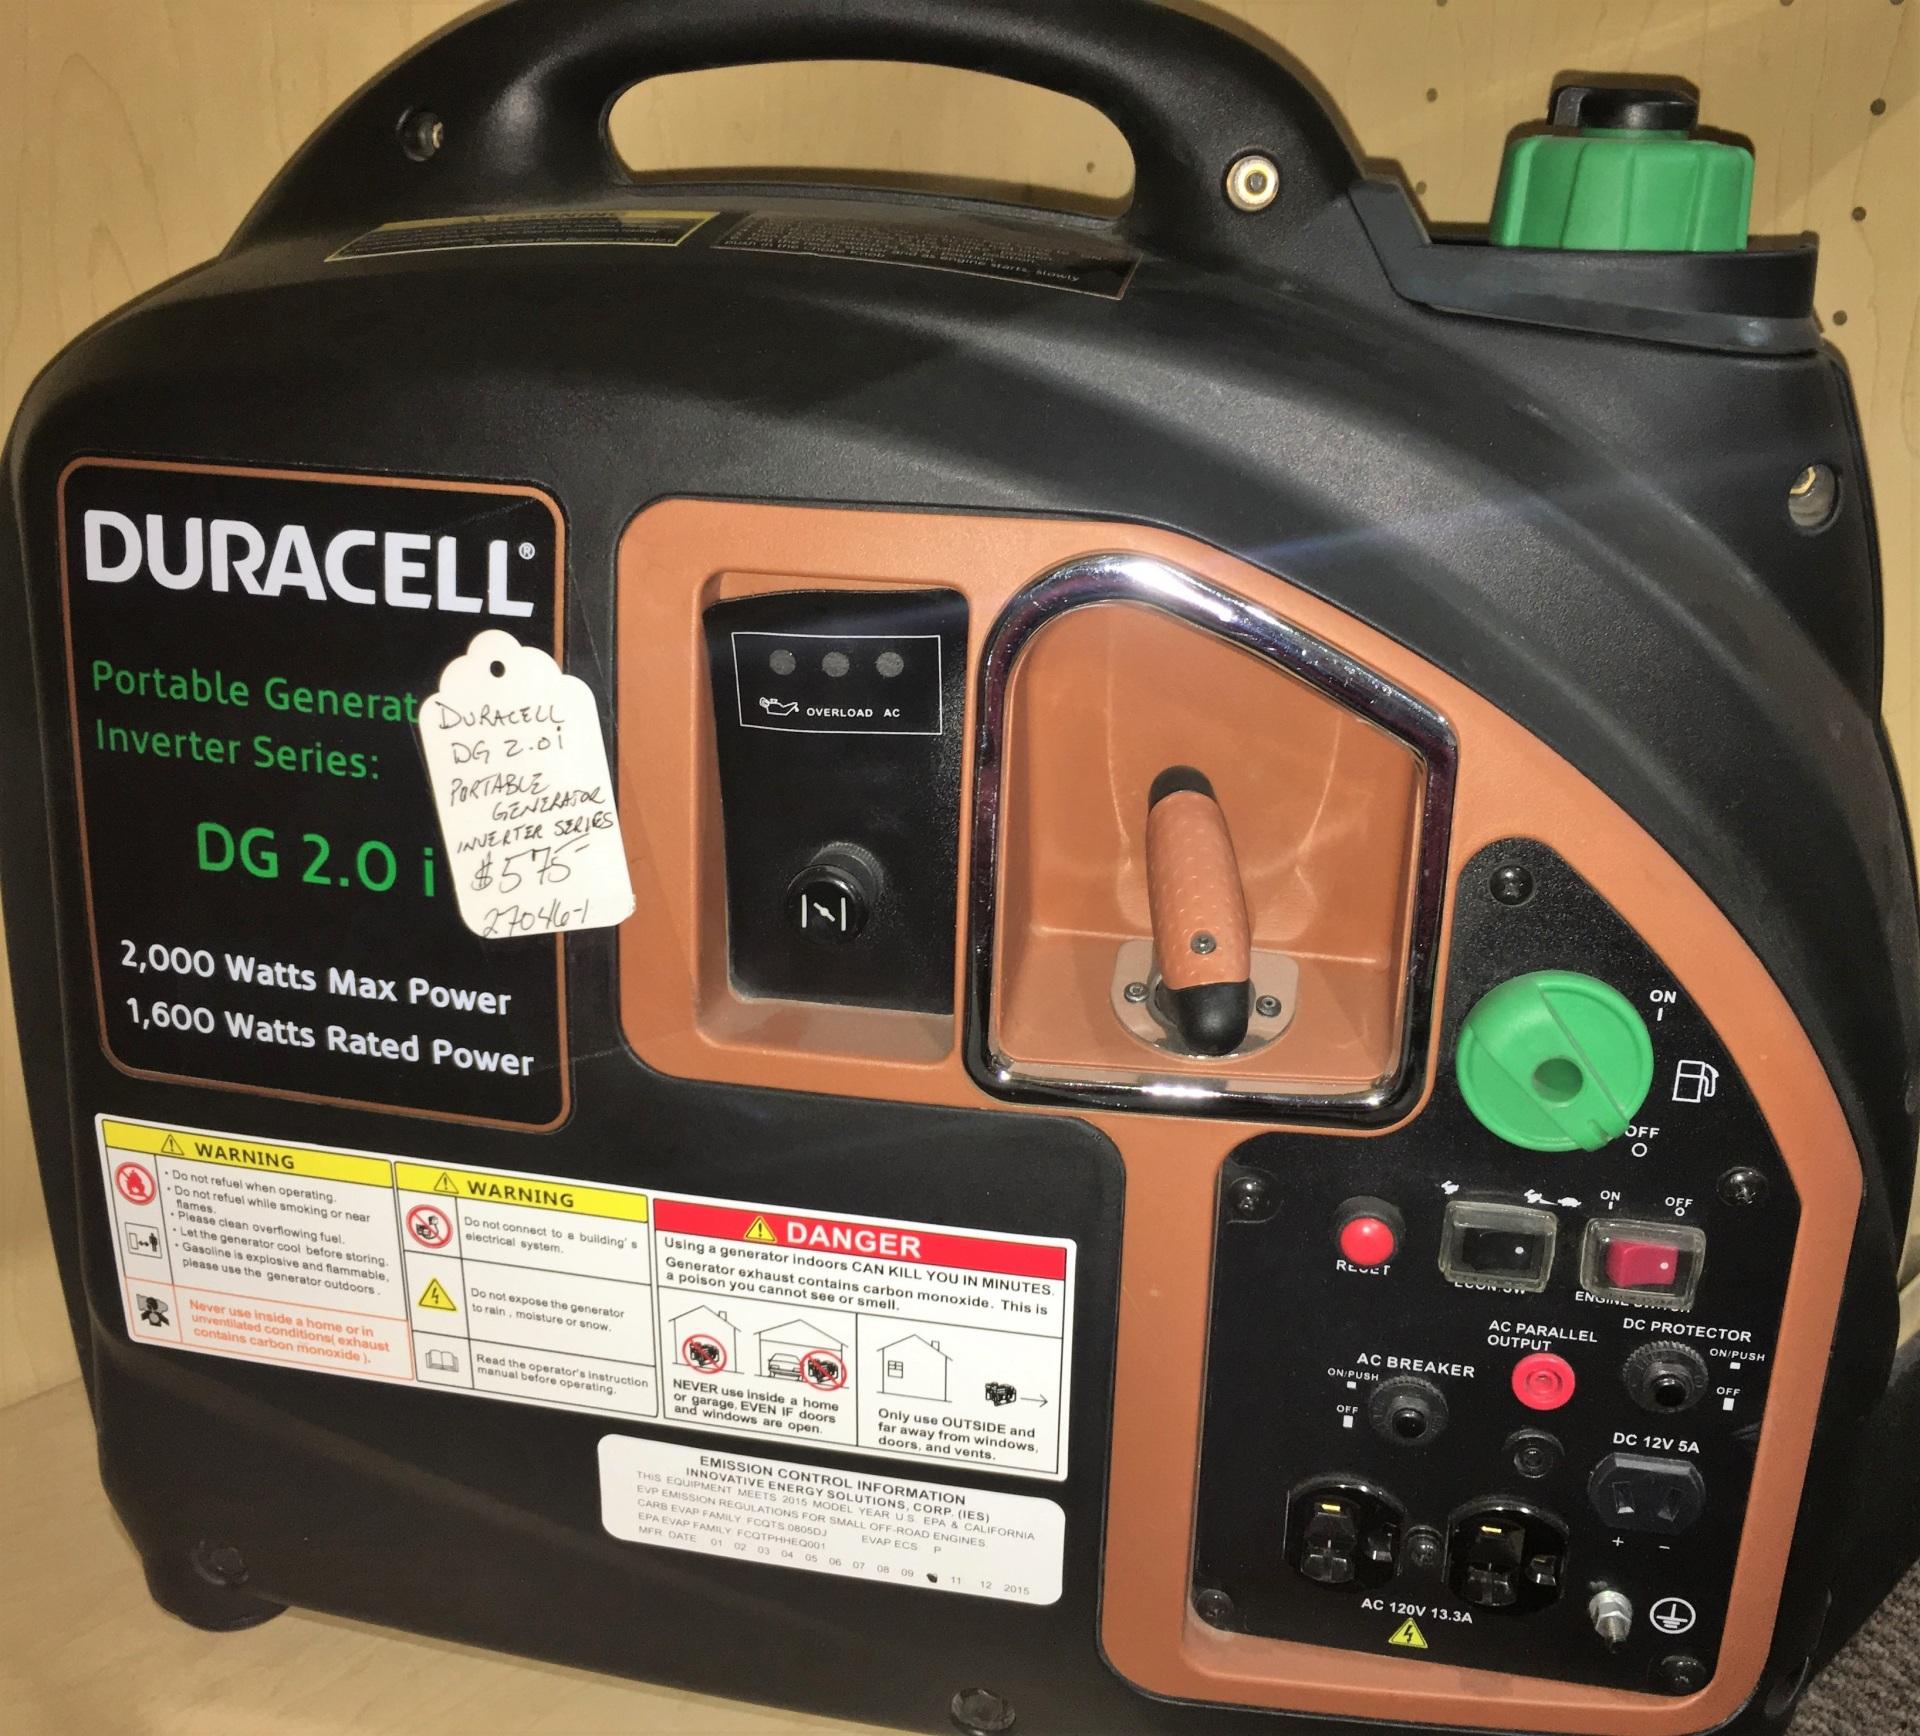 Duracell 2000w generator/inverter